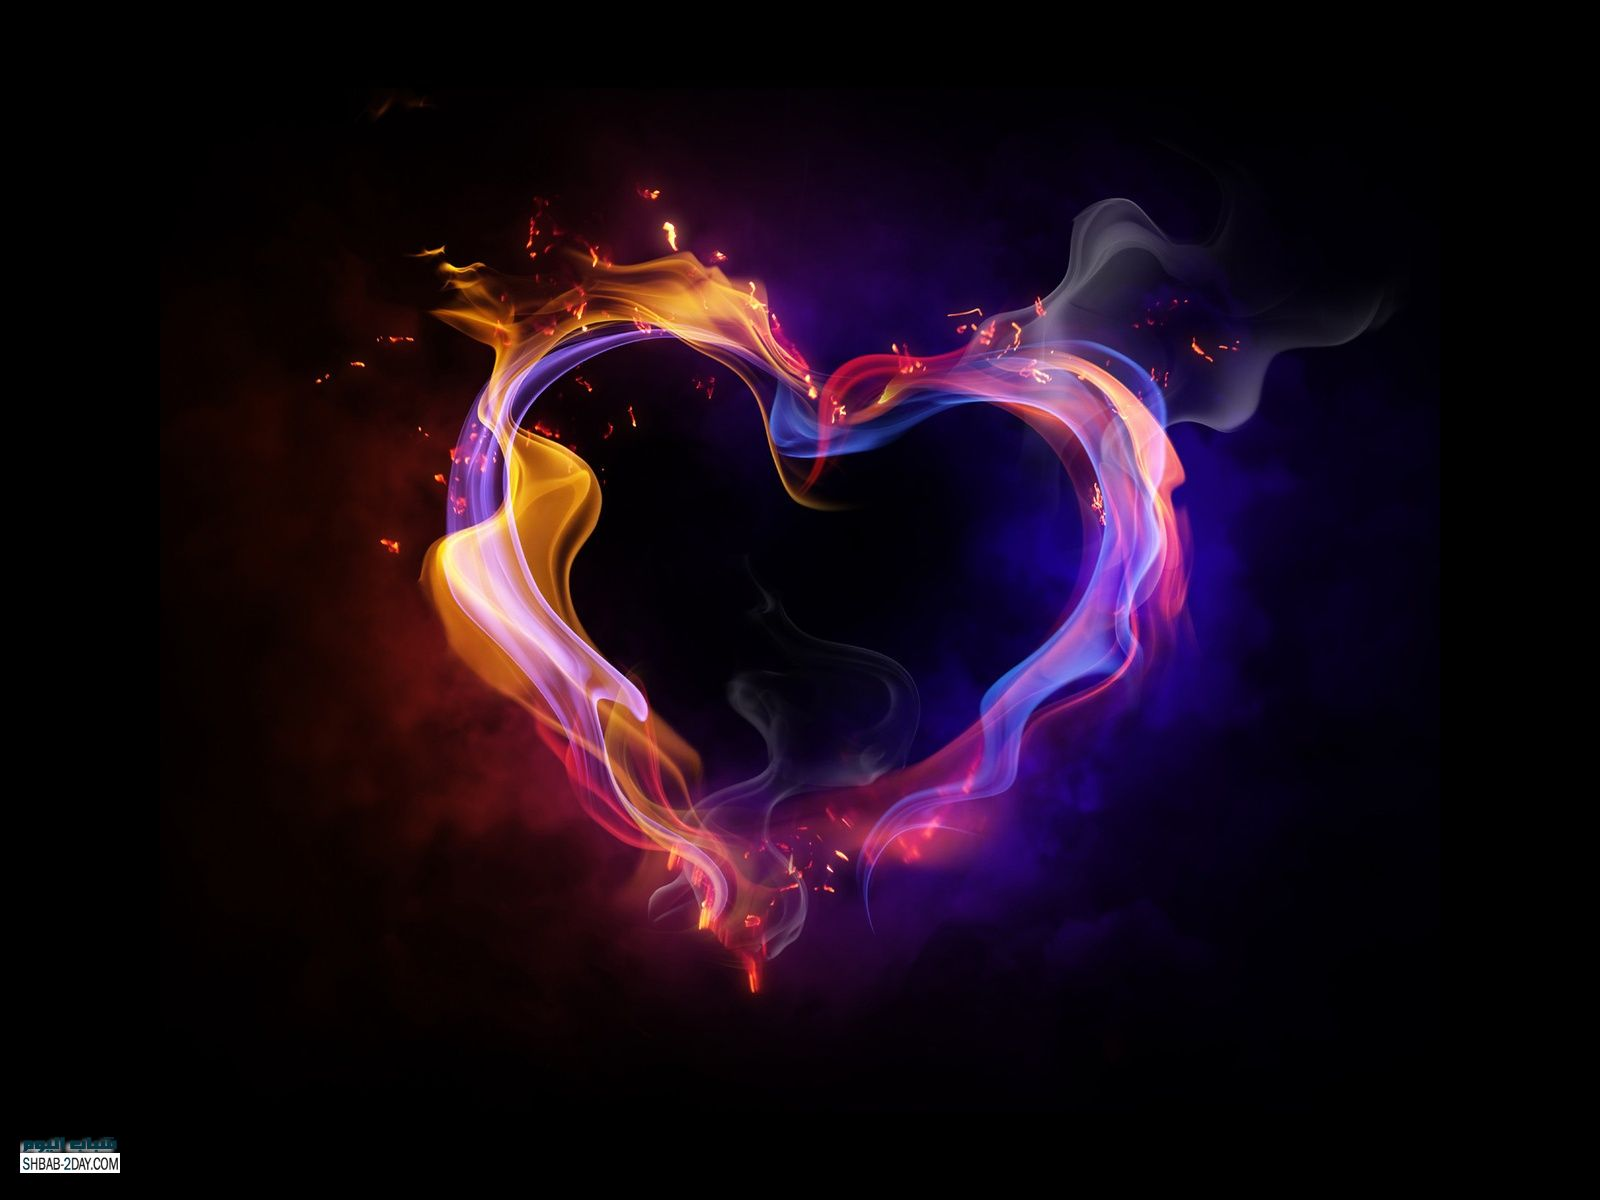 صور خلفيات قلوب